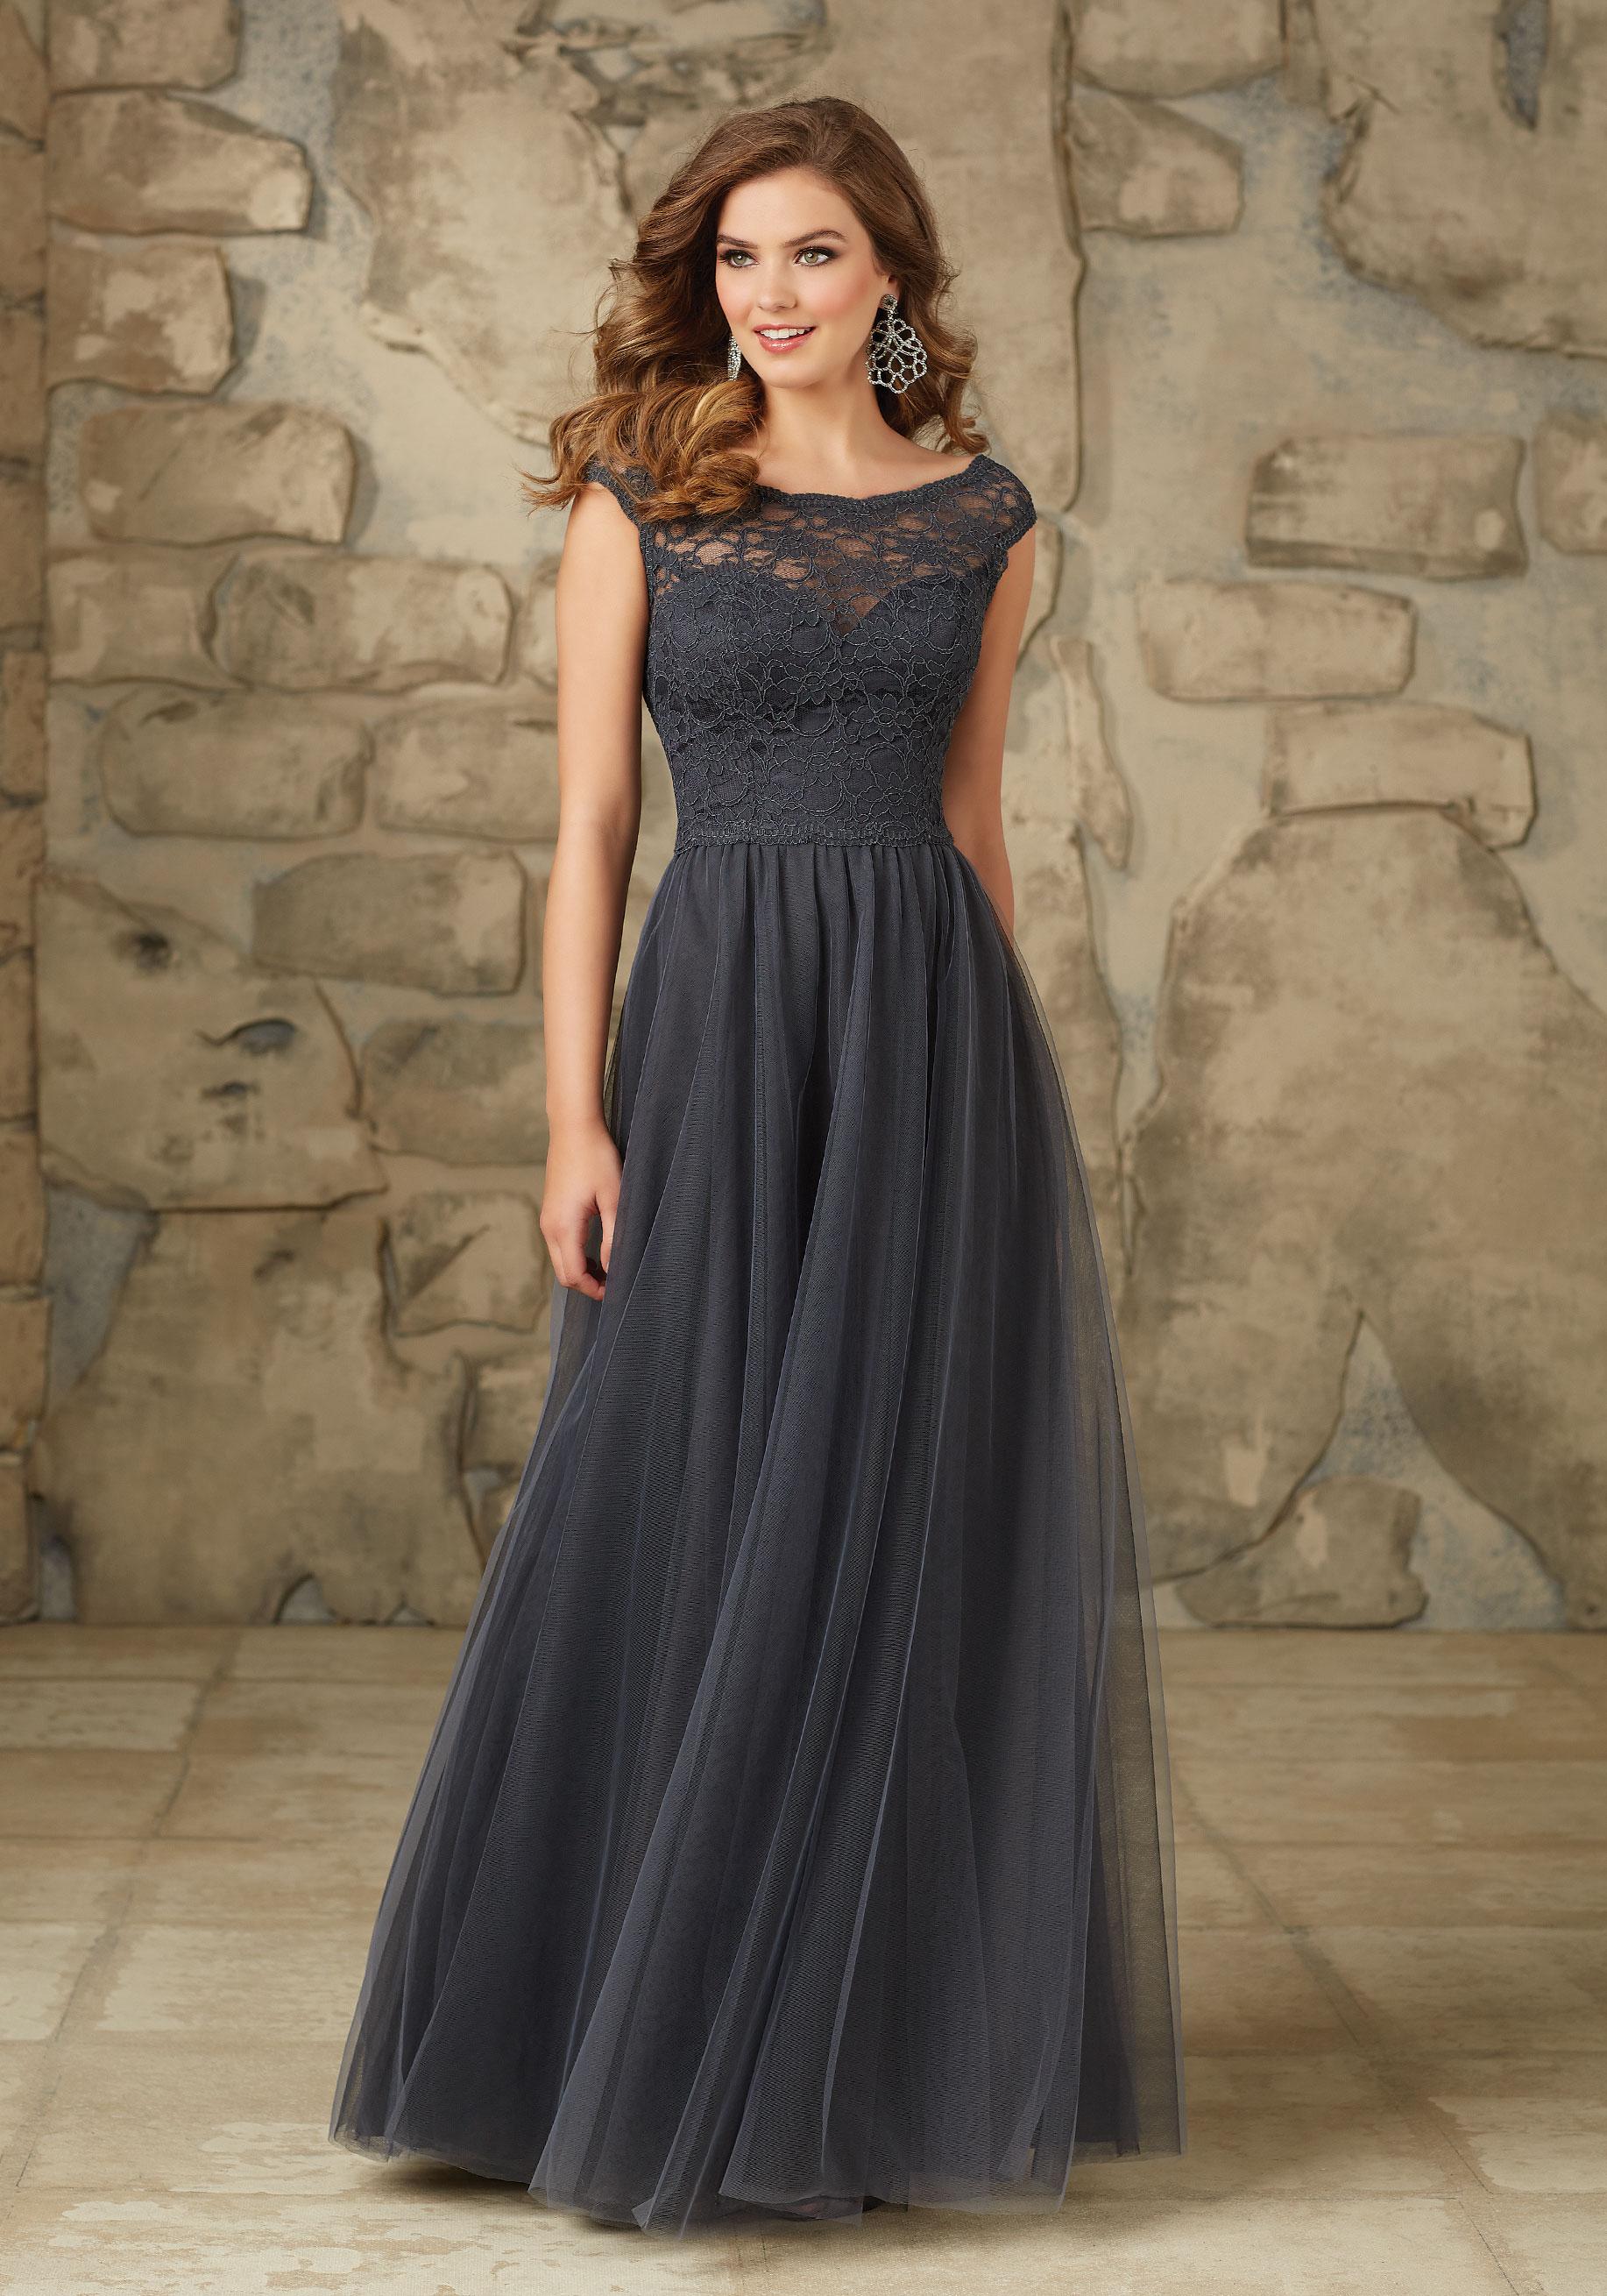 2a00ce231f6 Mori lee 111 bridesmaid dress - Catrinas Bridal